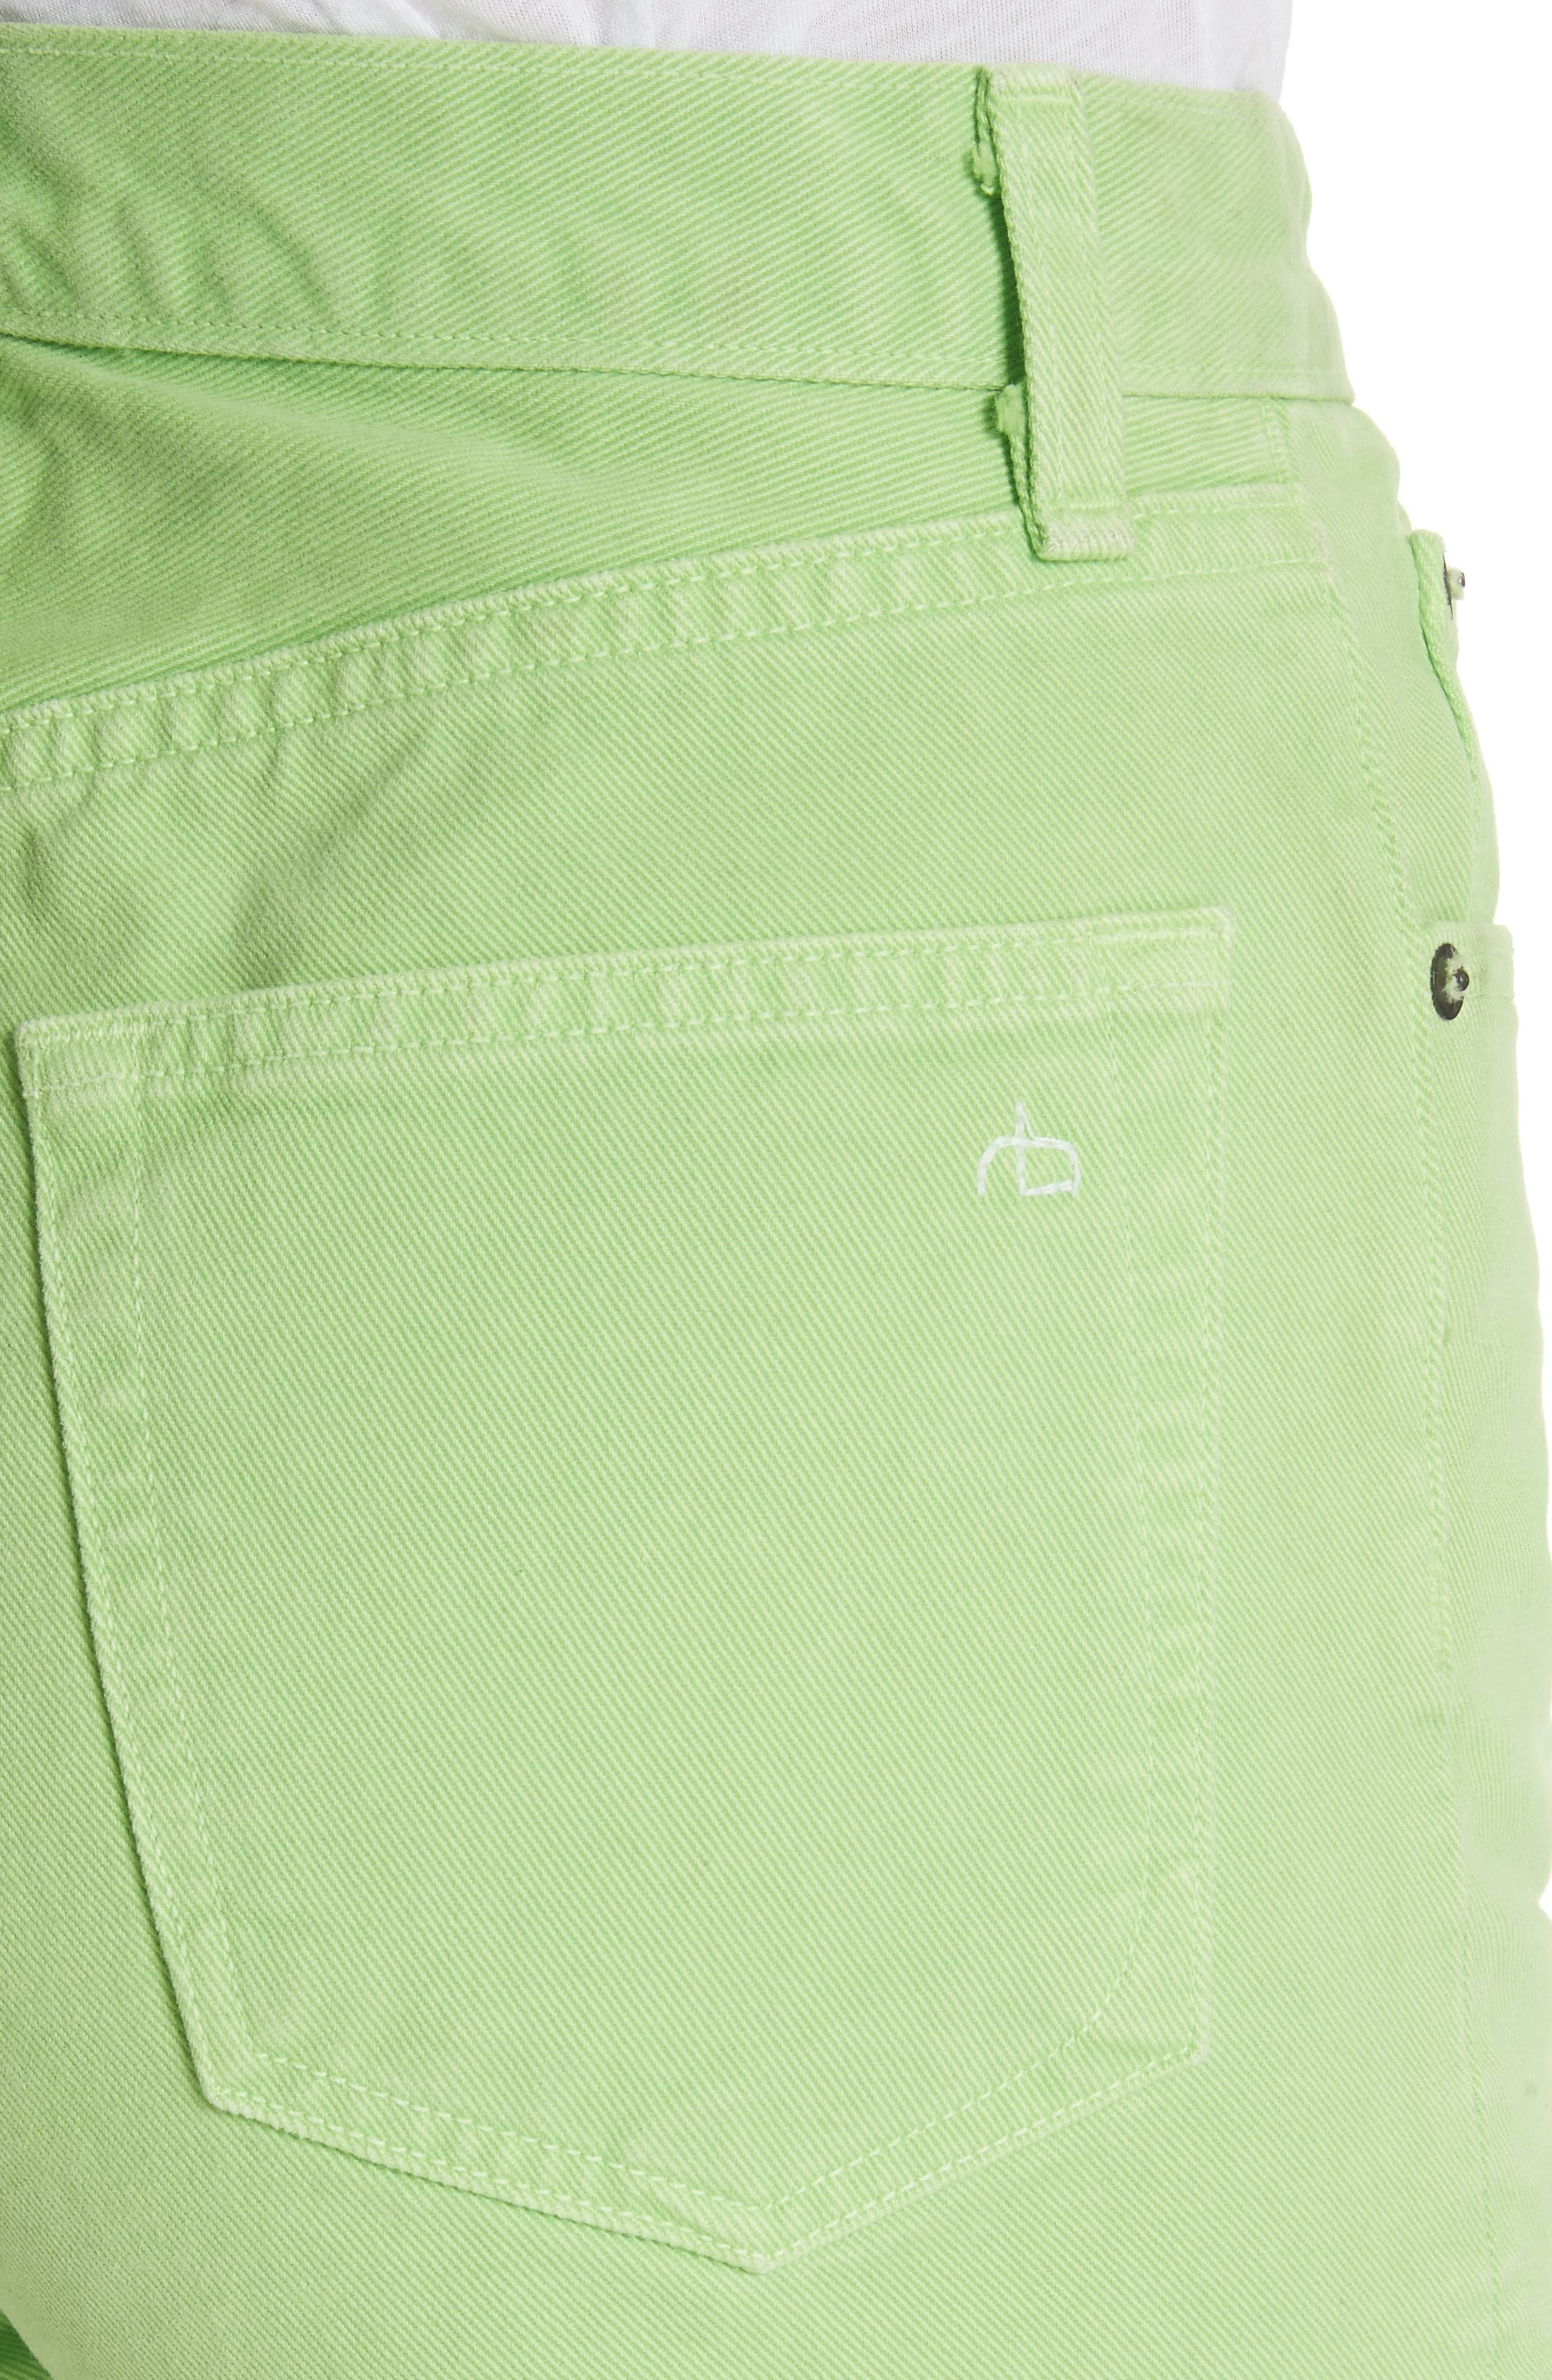 Justine High Waist Denim Shorts,                             Alternate thumbnail 5, color,                             Lime